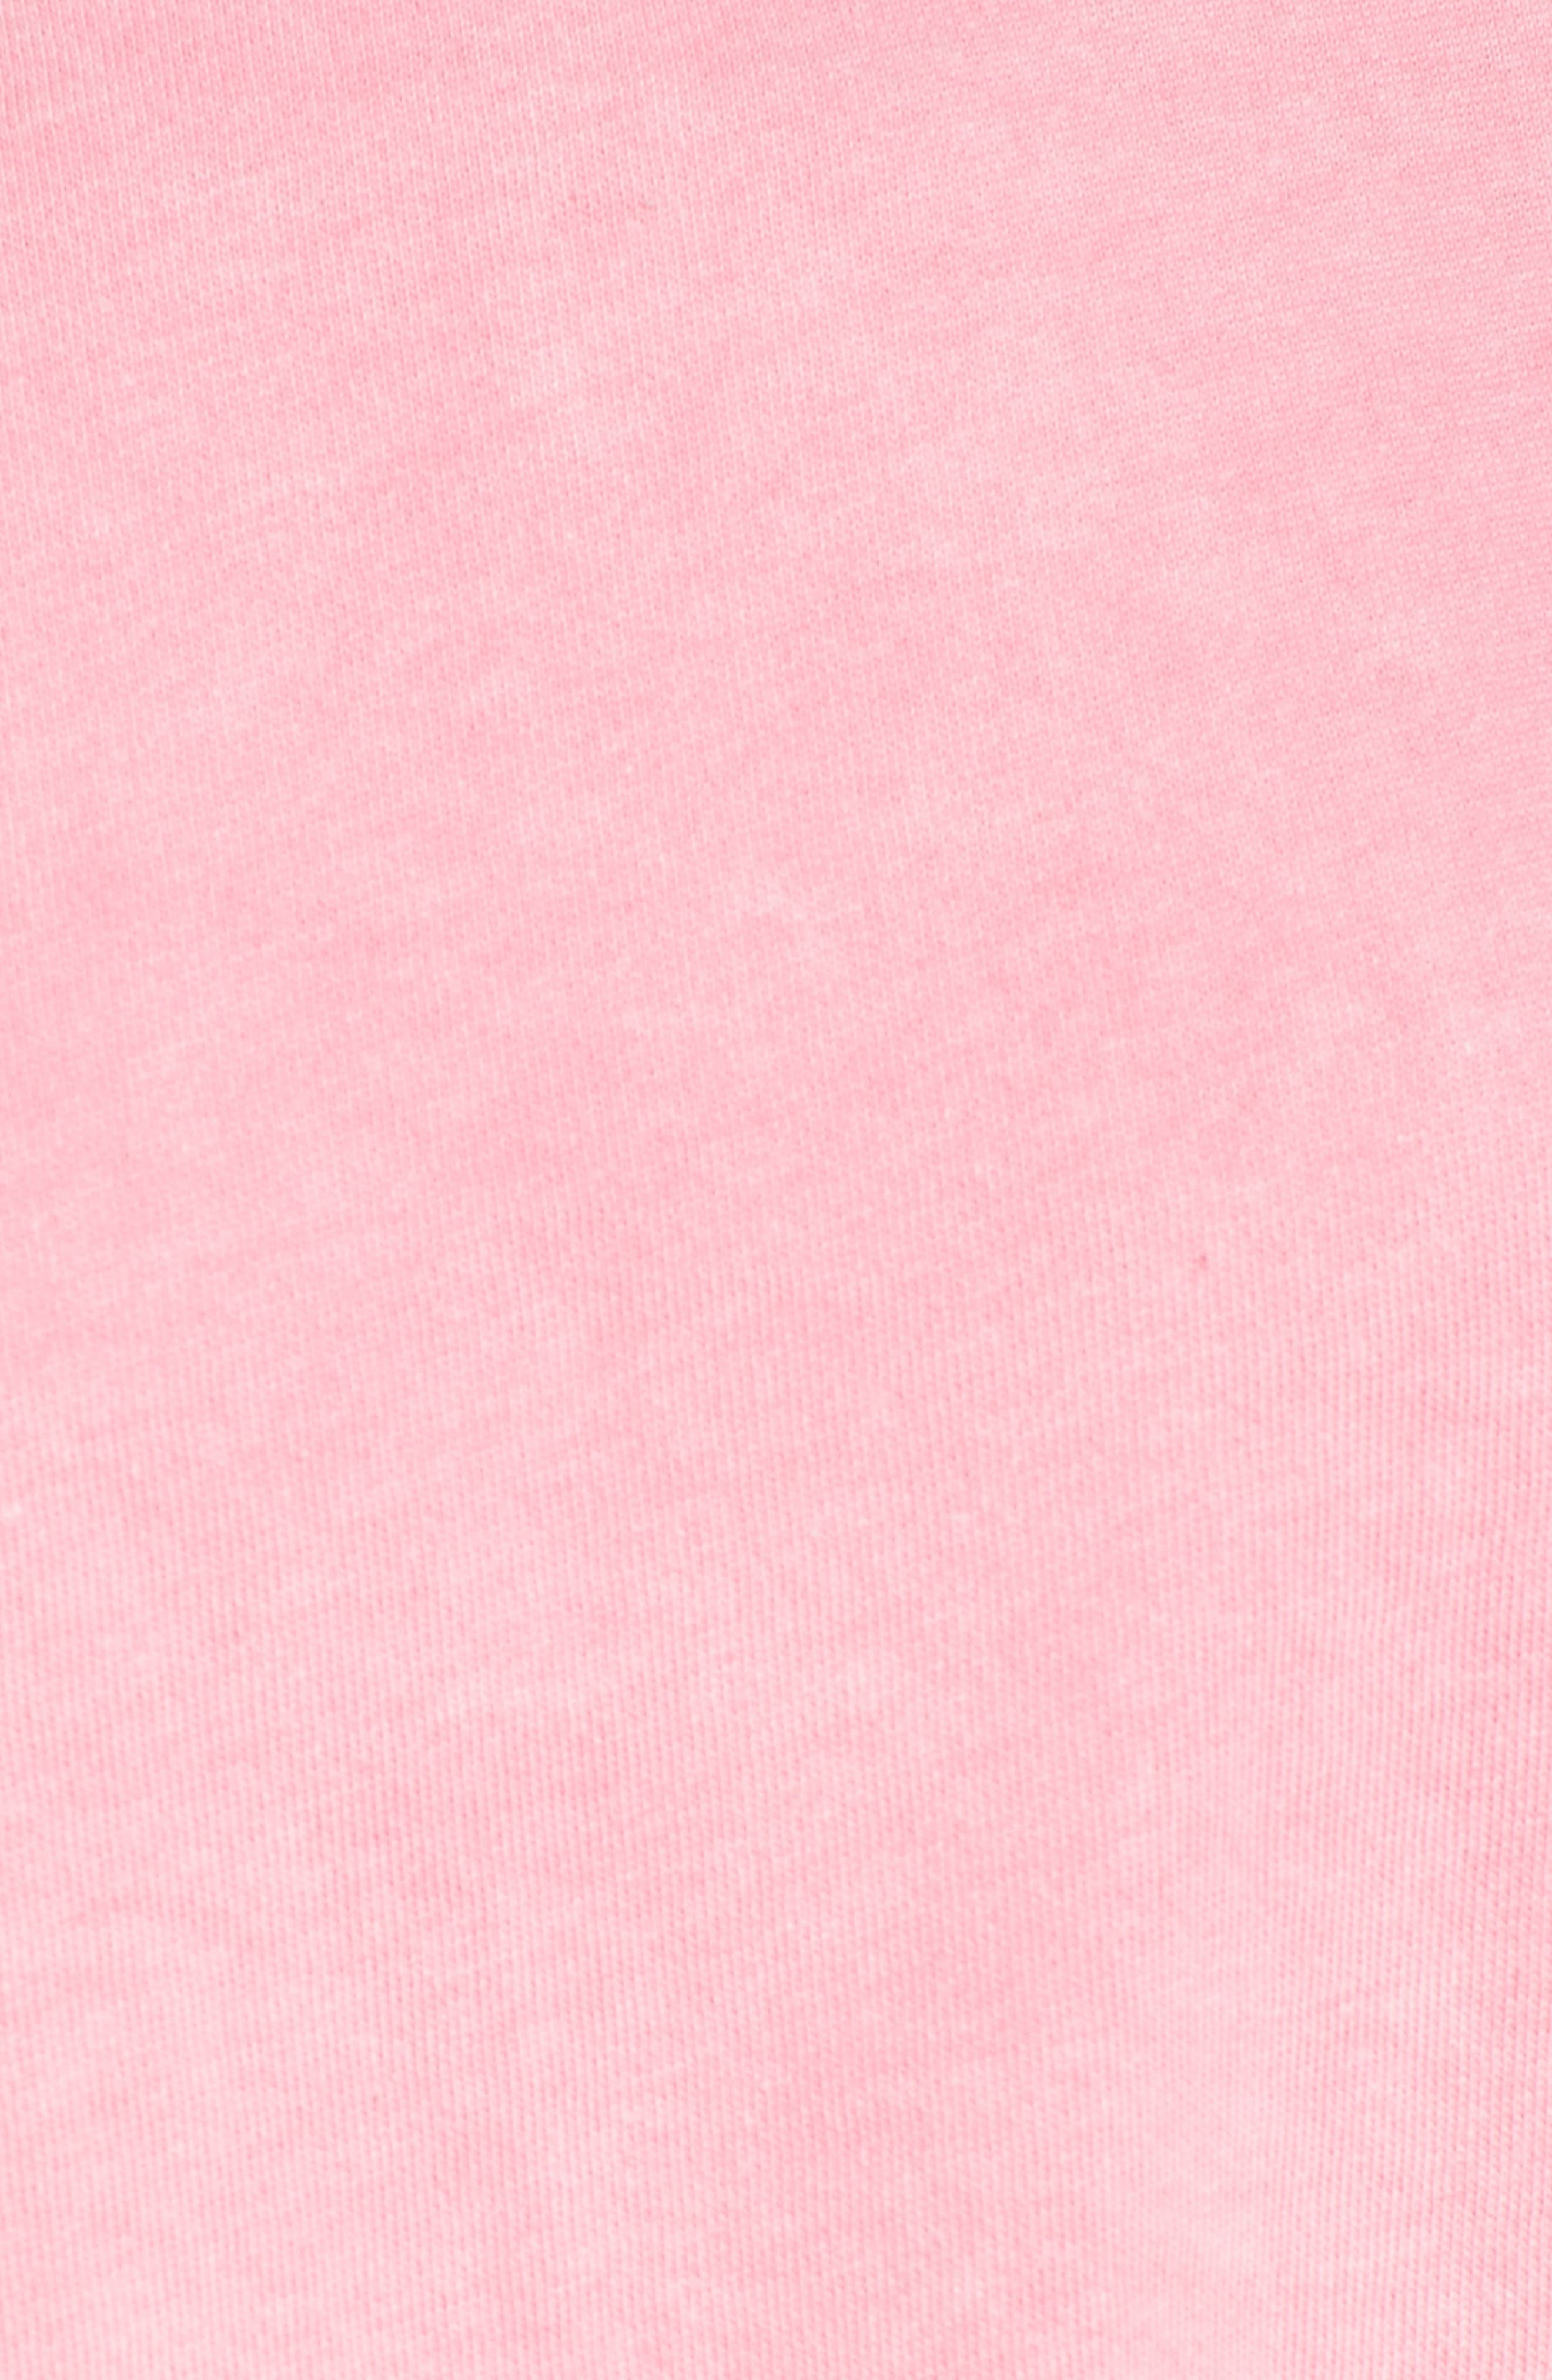 Washed Crop Sweatshirt,                             Alternate thumbnail 5, color,                             Pink